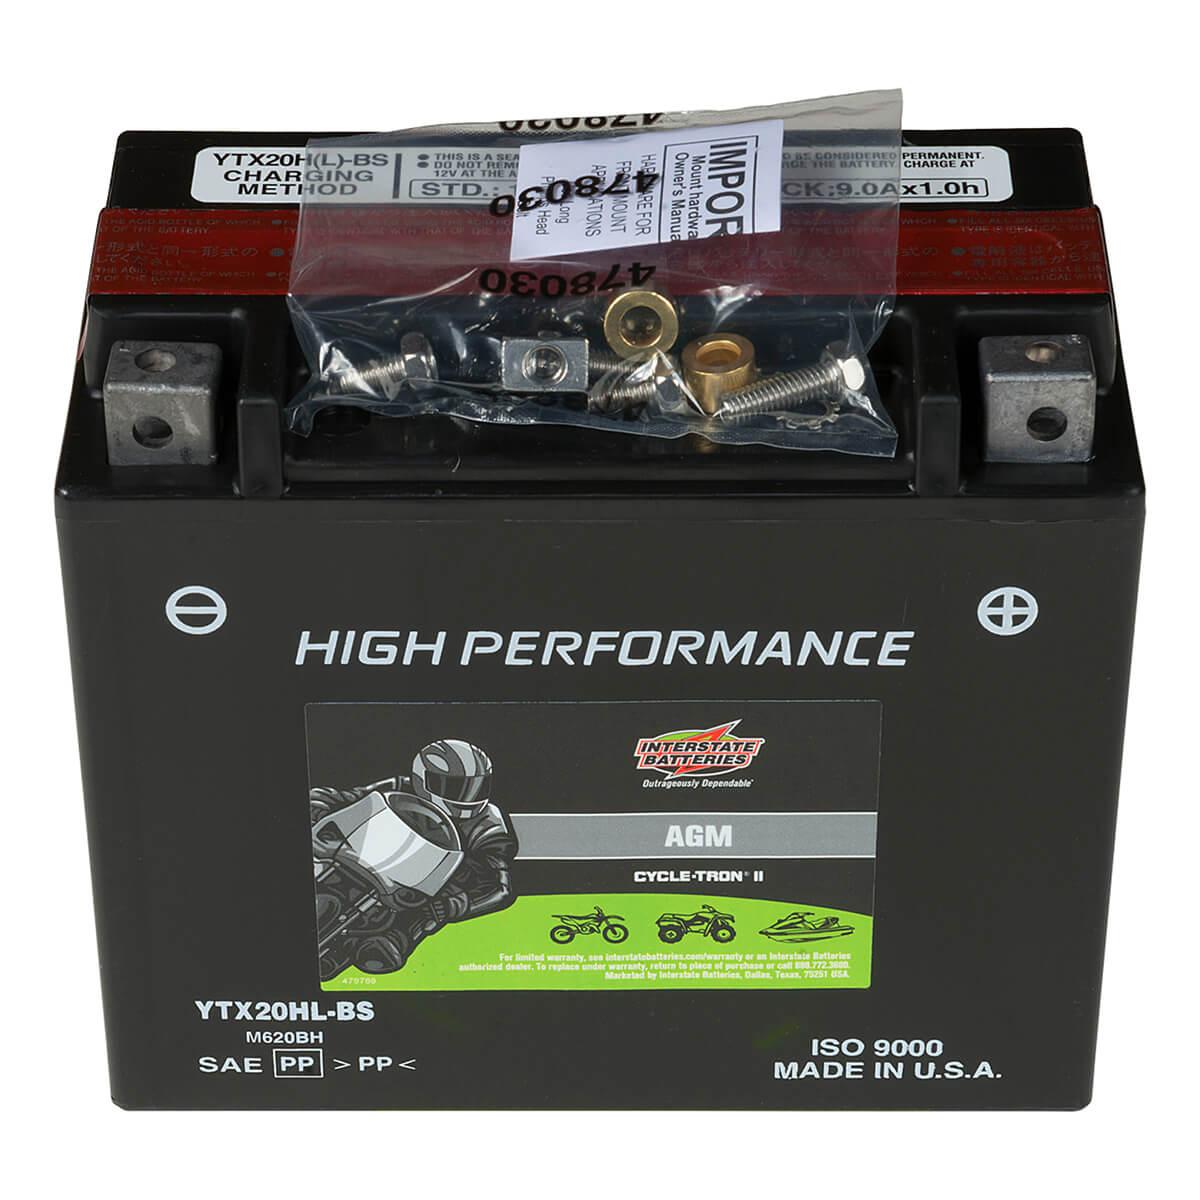 Cycletron AGM 12 Volt Battery, Non Spillable - CYTX20HL-BS